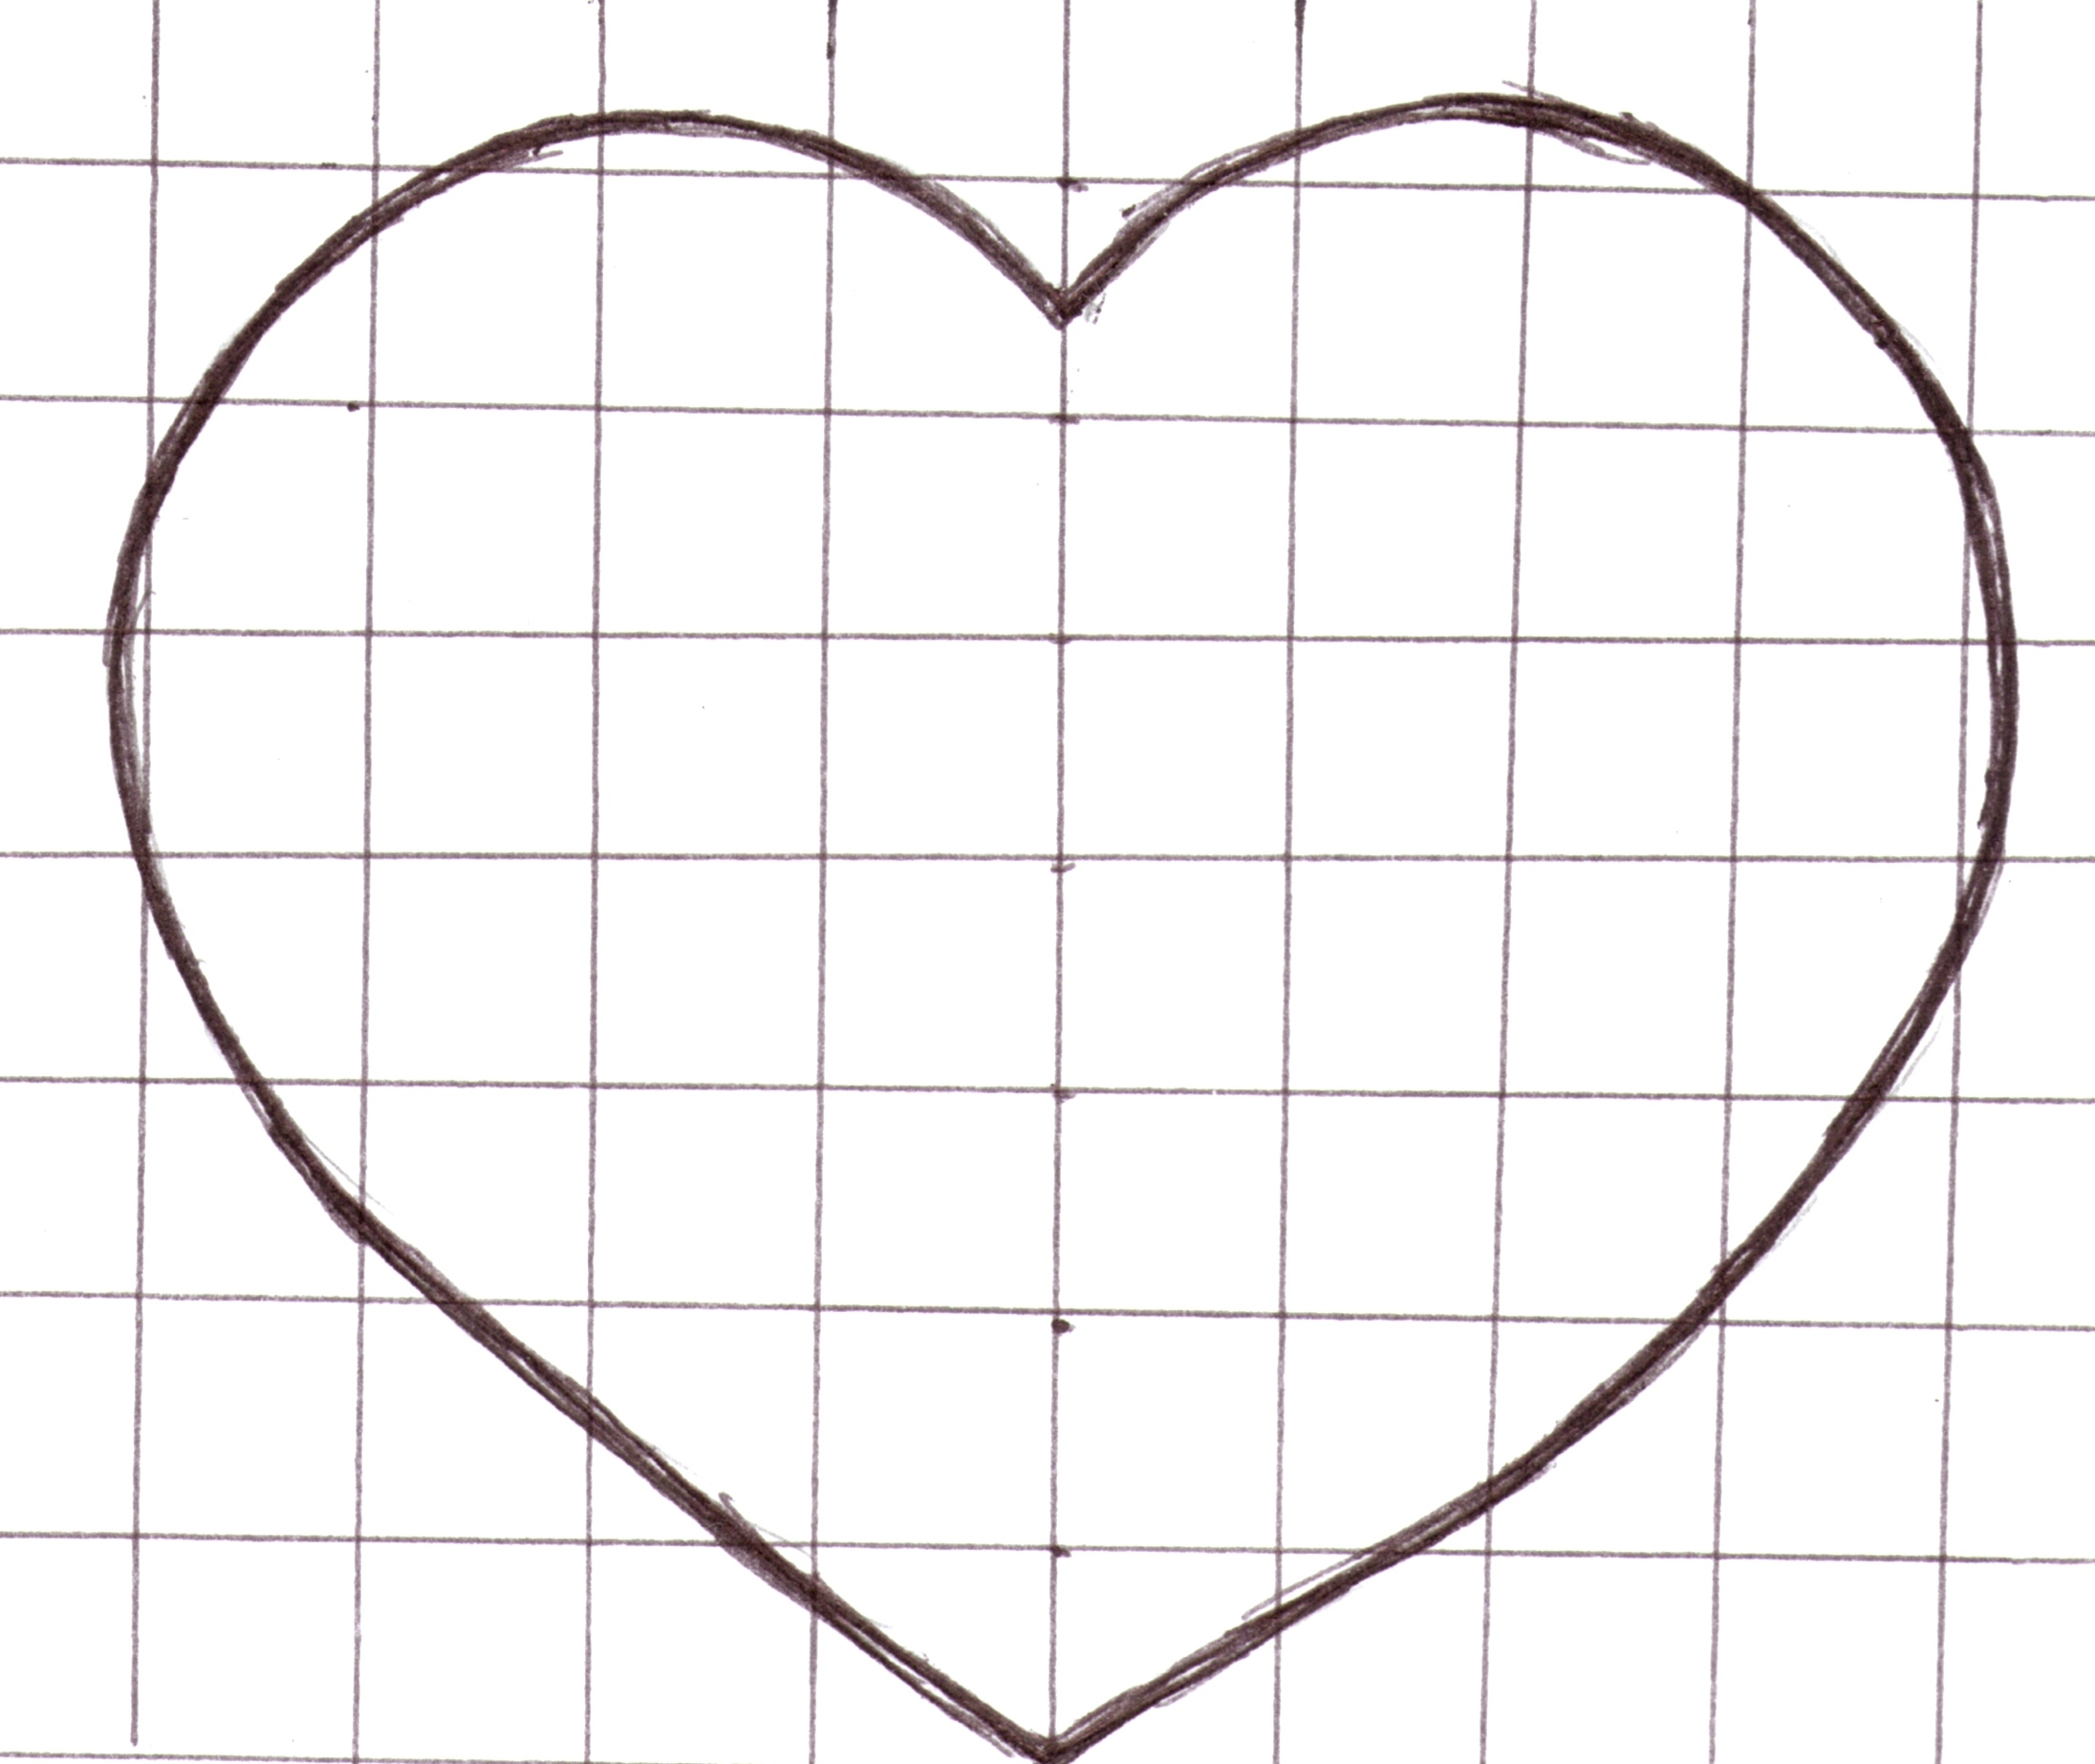 Кожаный брелок чертеж